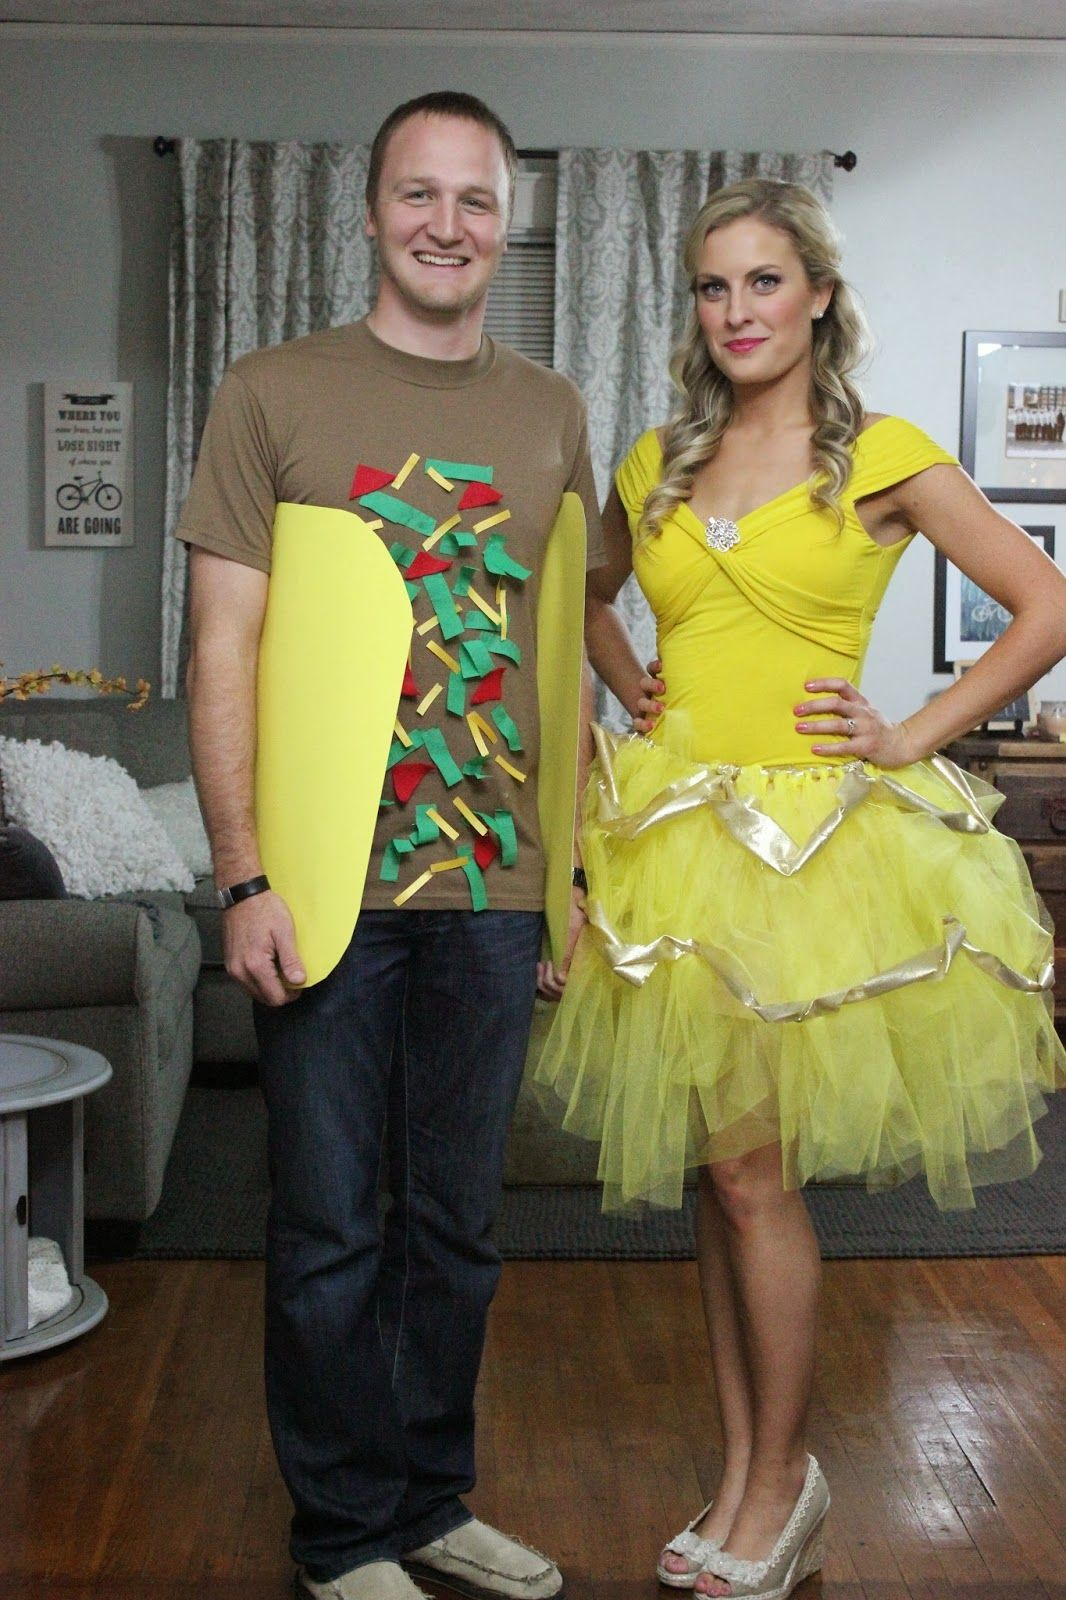 DIY Couples Halloween Costume Ideas Cute couple